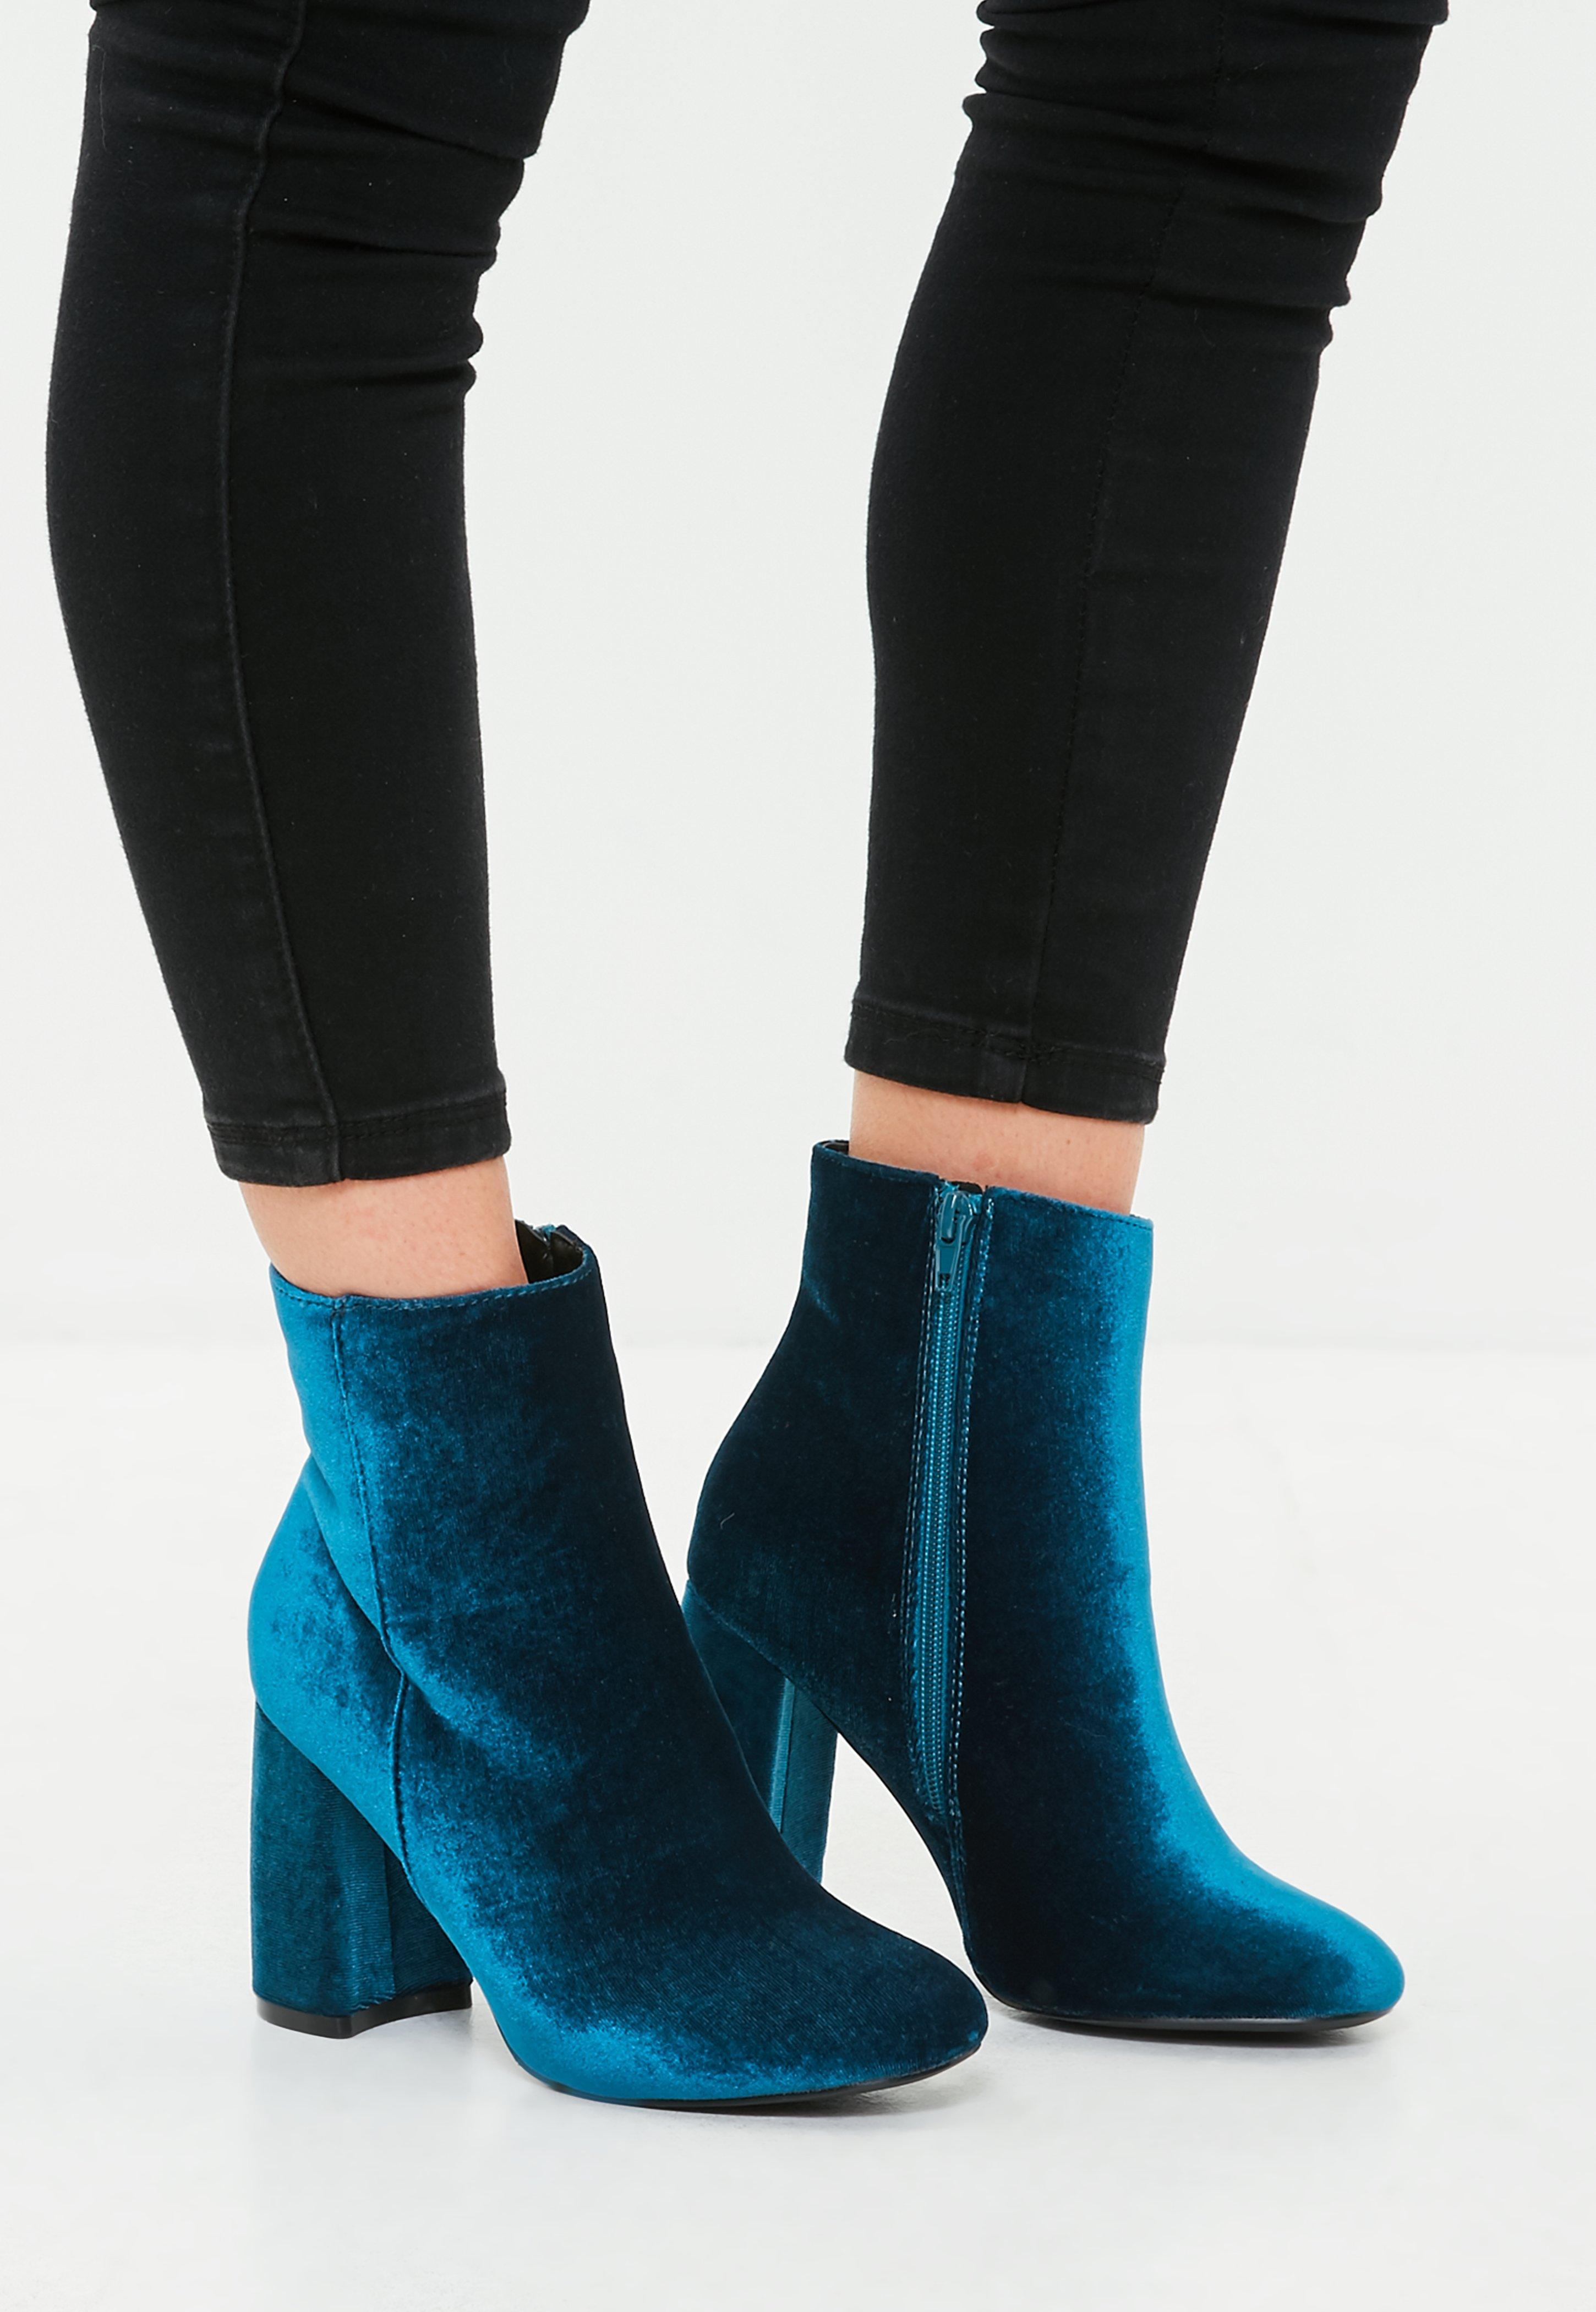 Manchester Great Sale Online velvet boots New Release Finishline Online Y3PZcYY